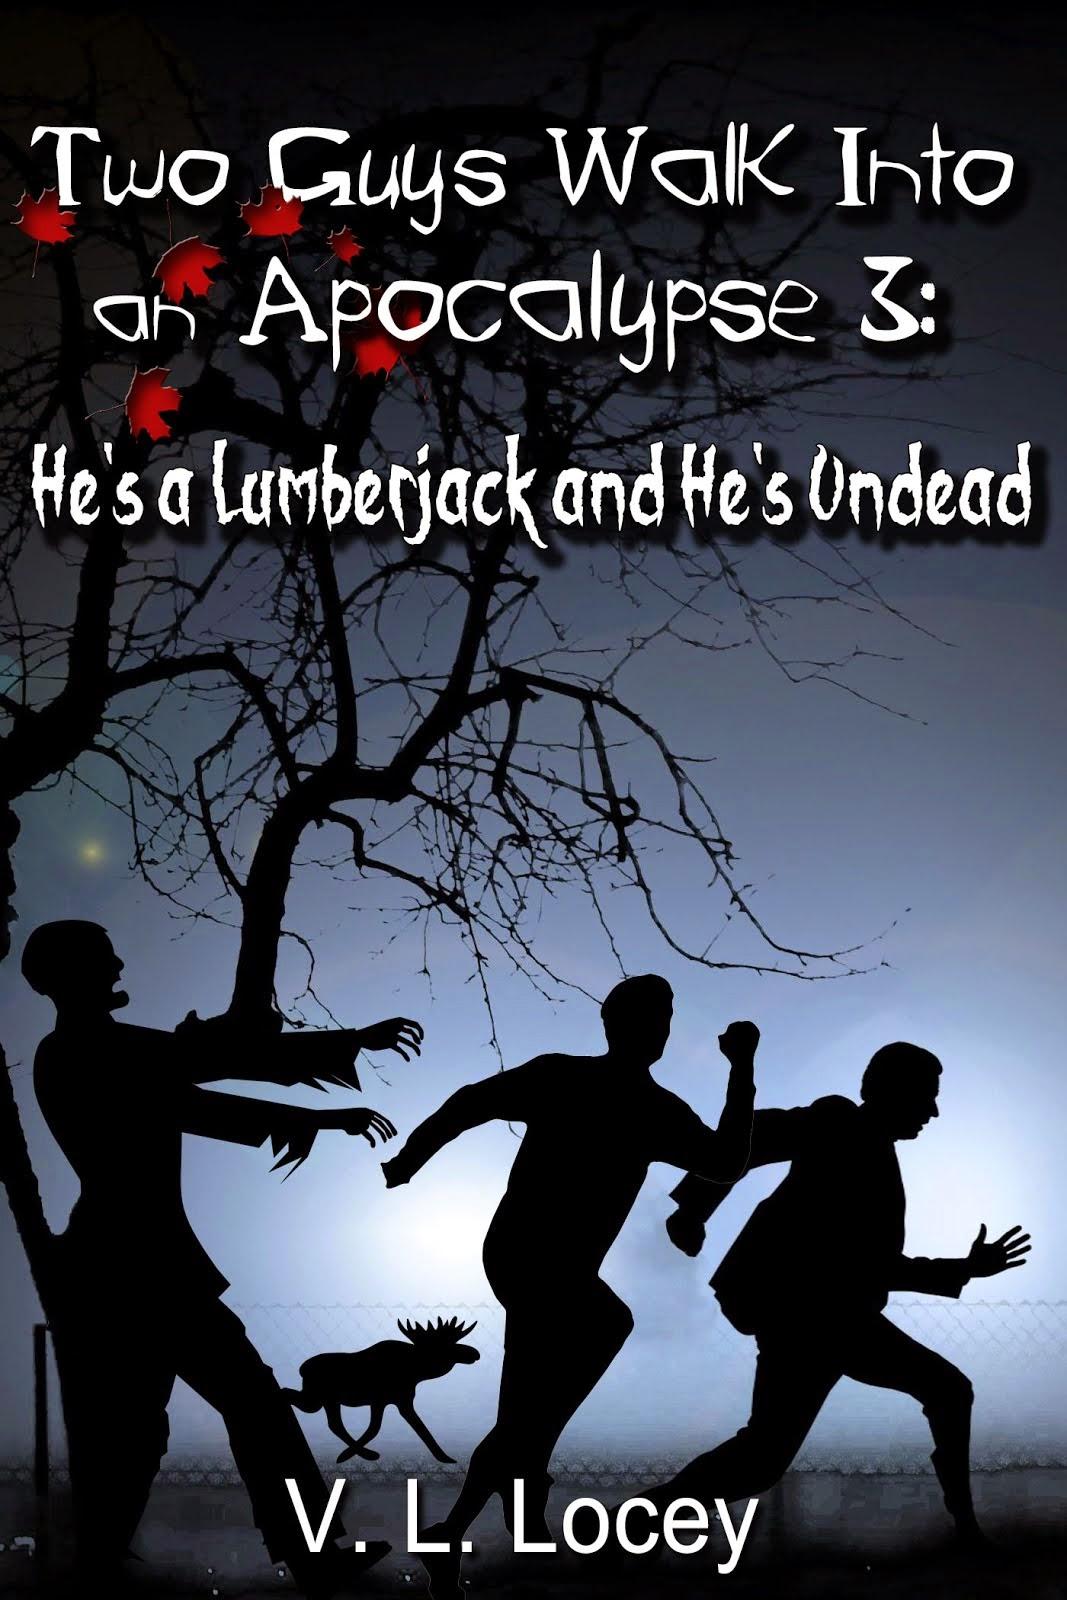 Two Guys Walk Into an Apocalypse 3